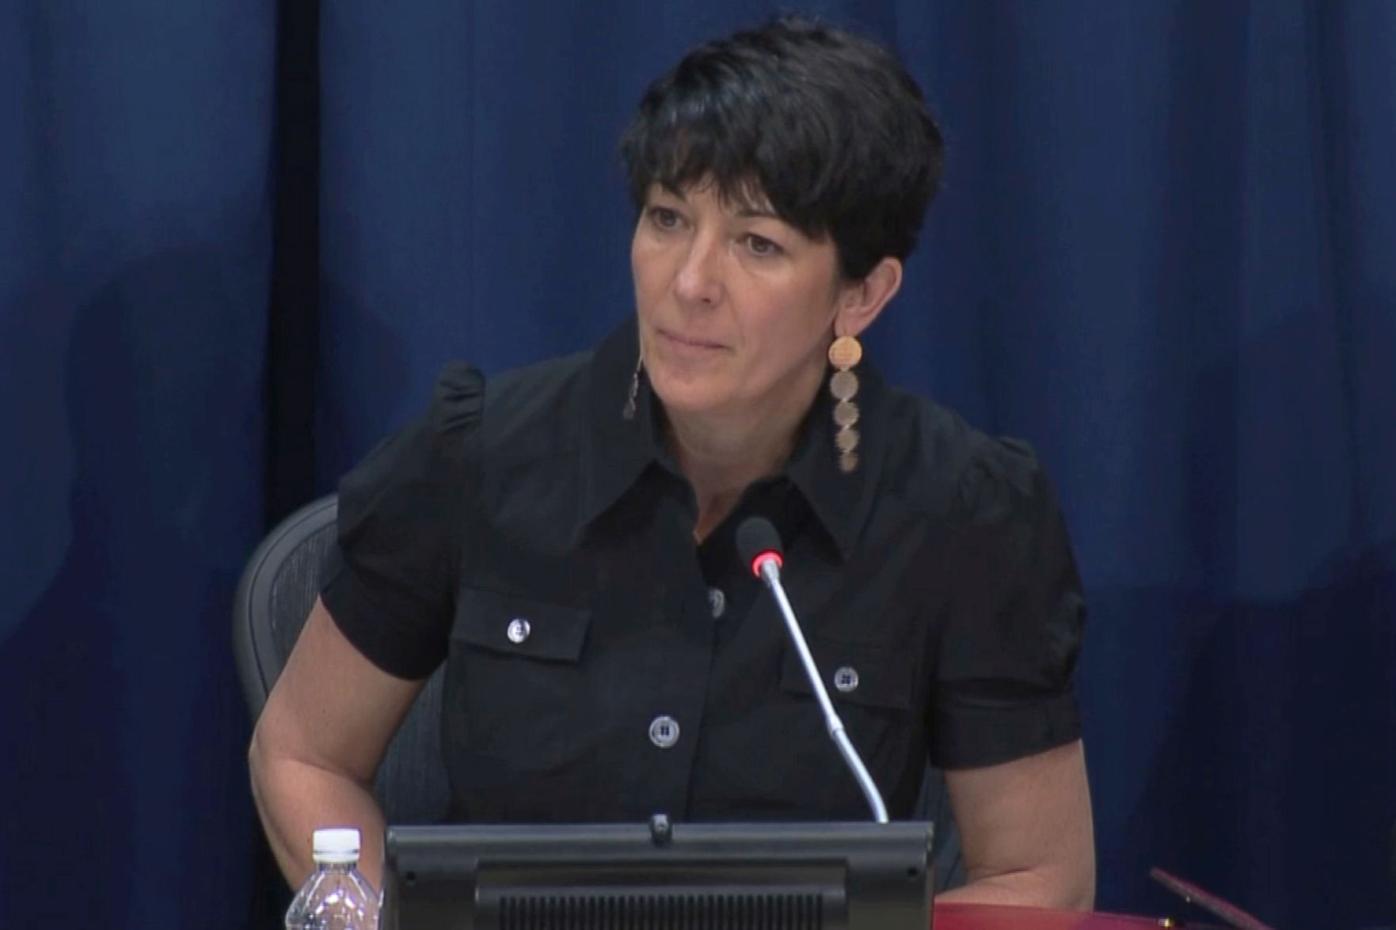 Ghislaine Maxwell, longtime associate of accused sex trafficker Jeffrey Epstein